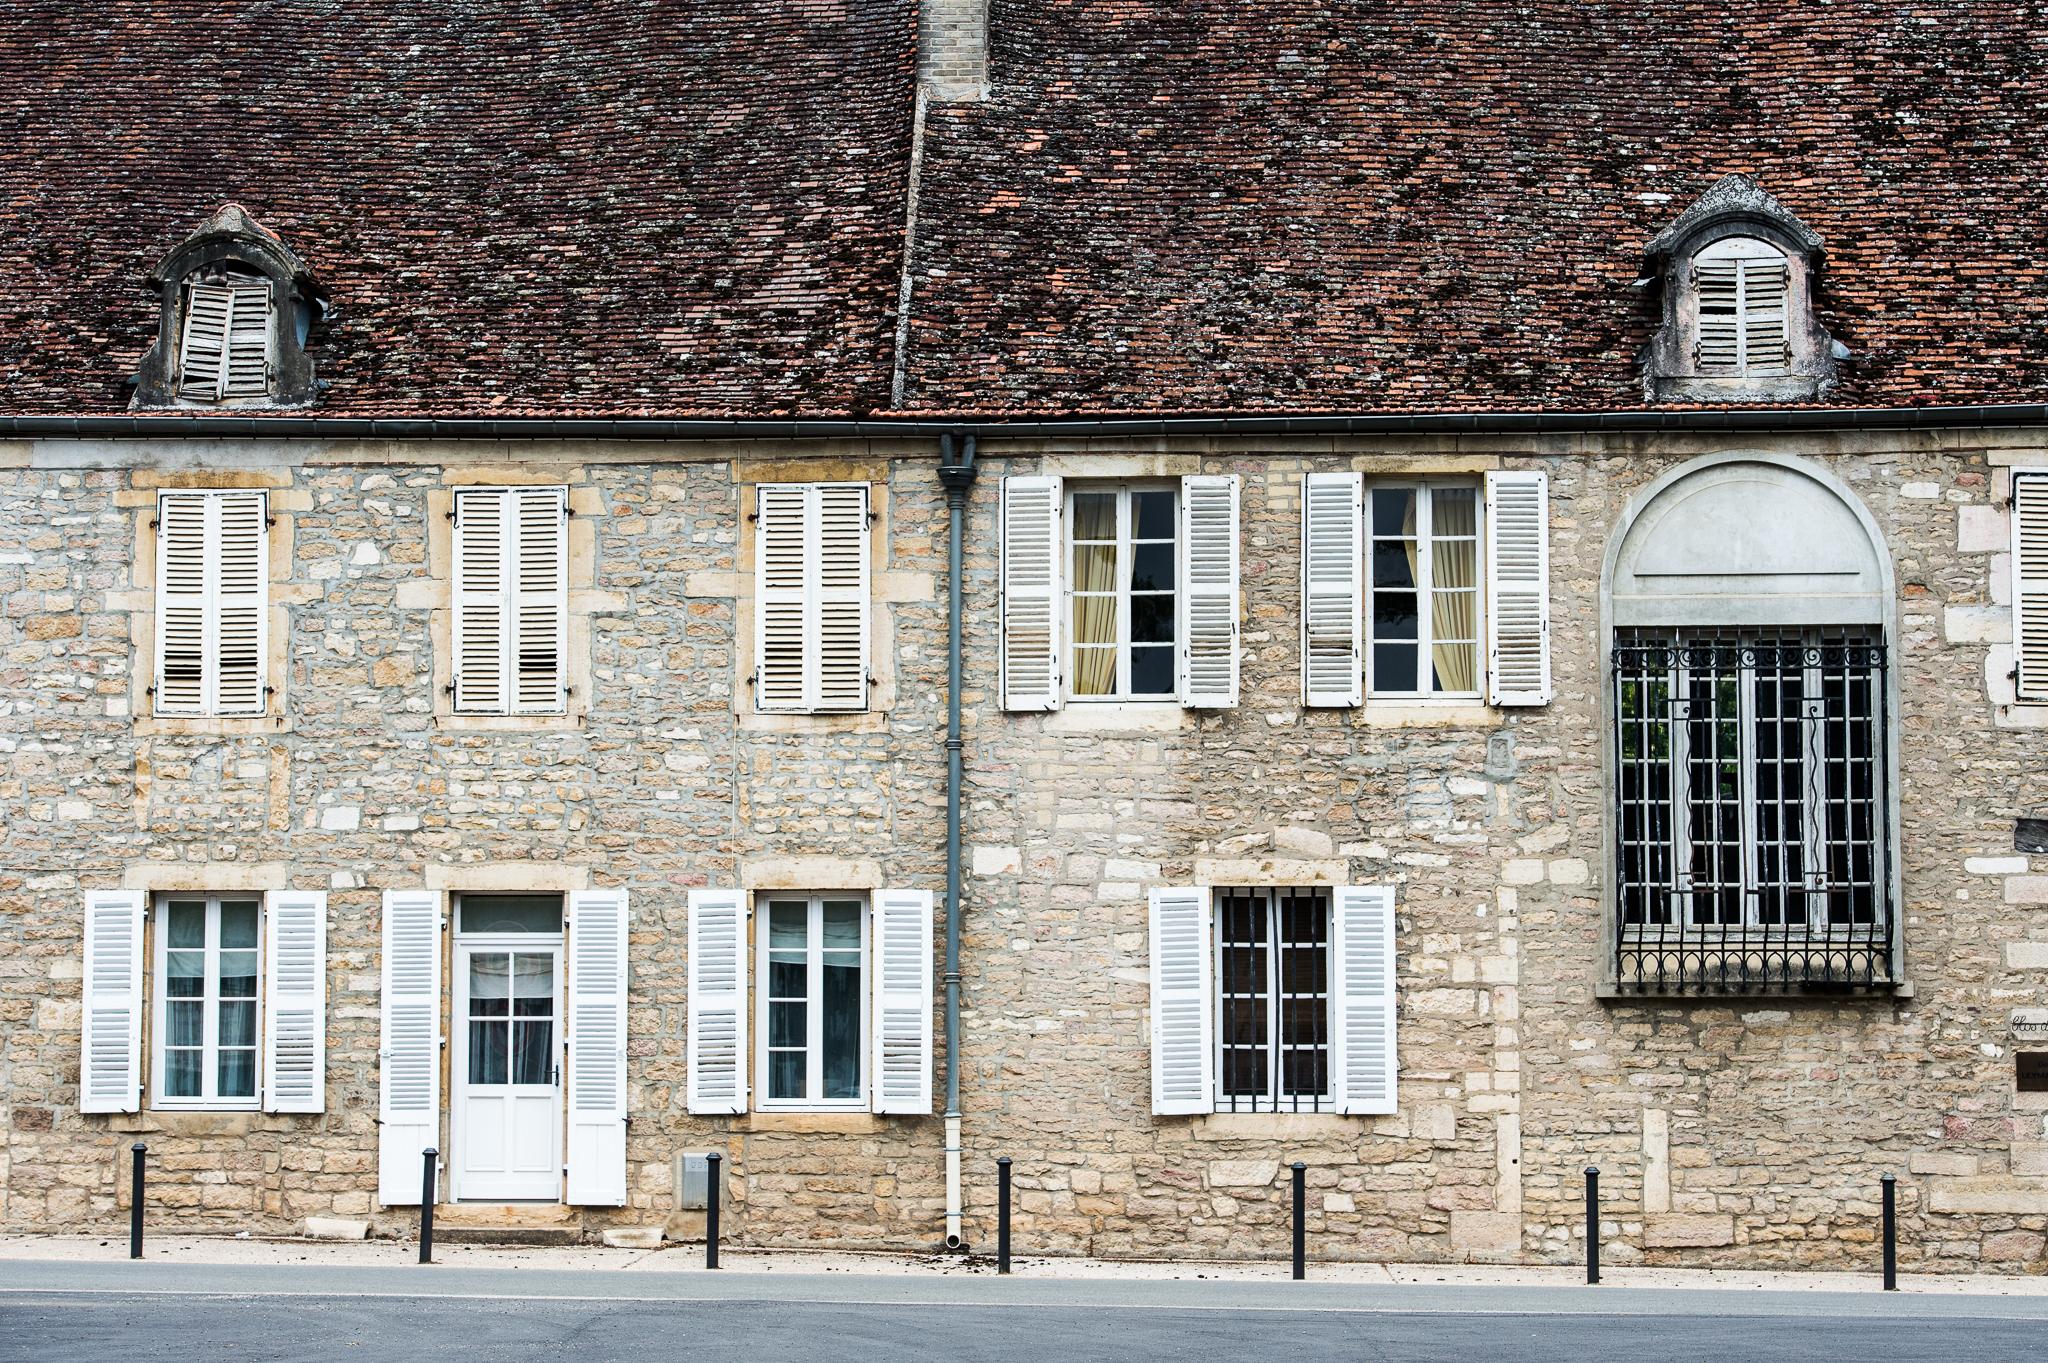 Jason-Davis-Images-Burgundy-0017.jpg